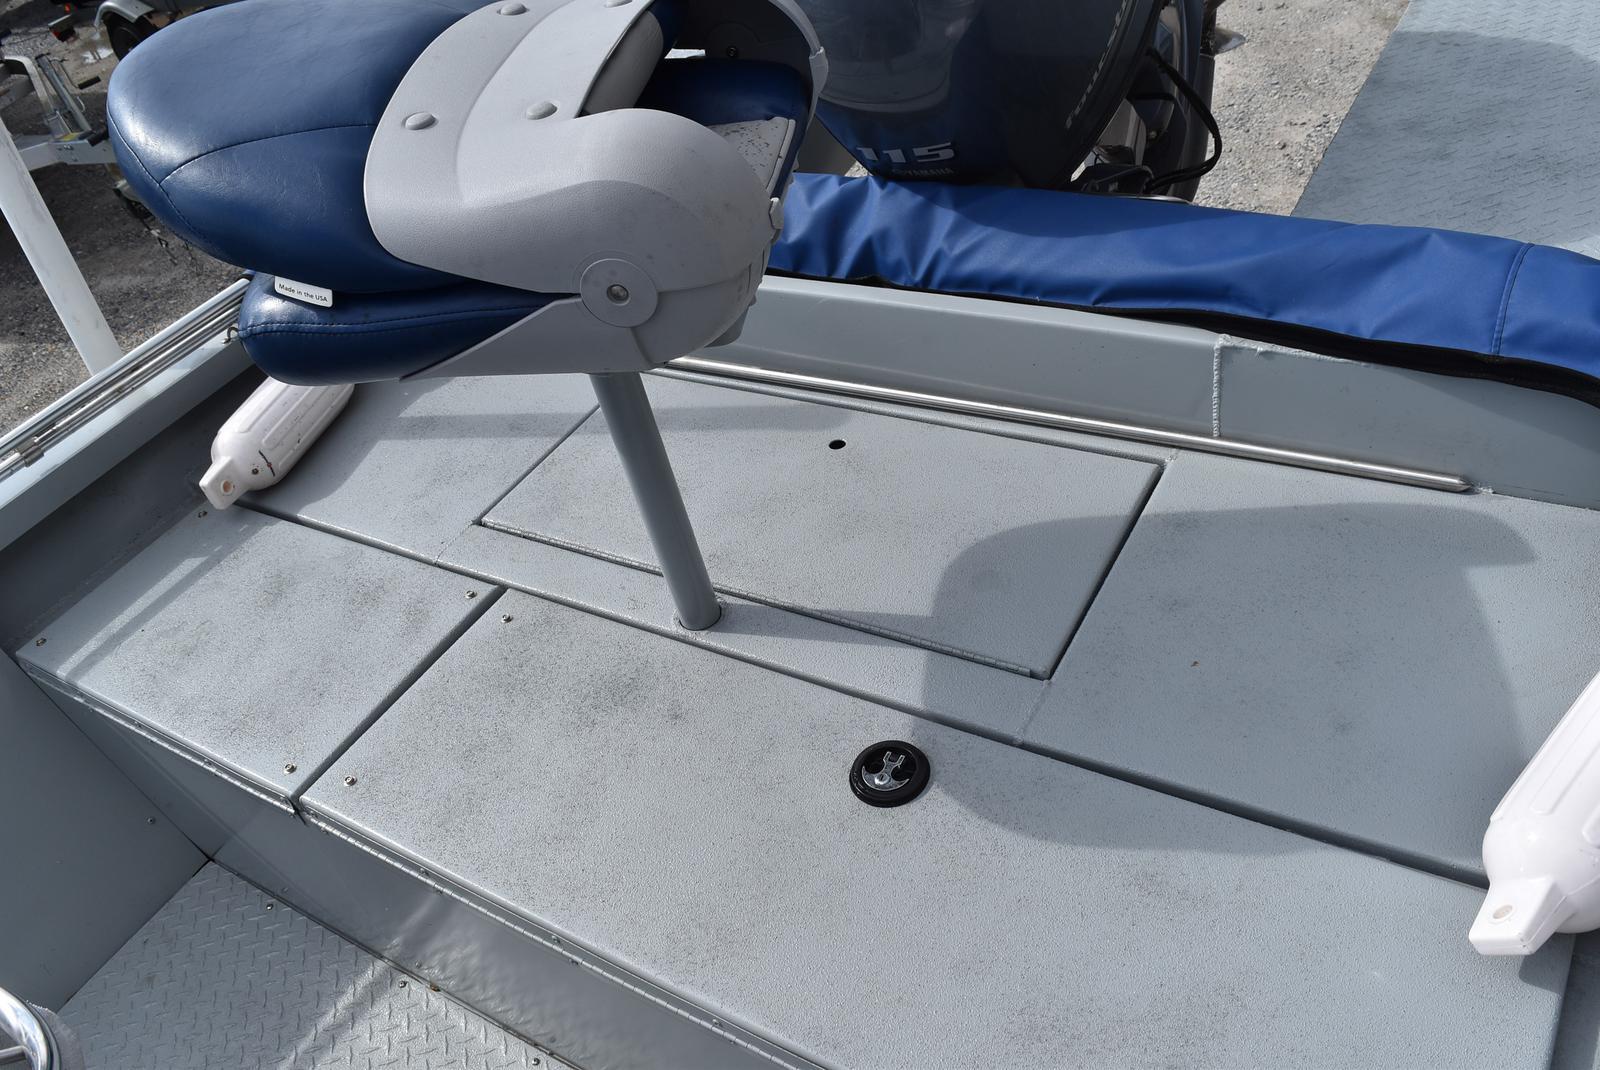 2017 Rockawell boat for sale, model of the boat is Alumafab 20 & Image # 7 of 11